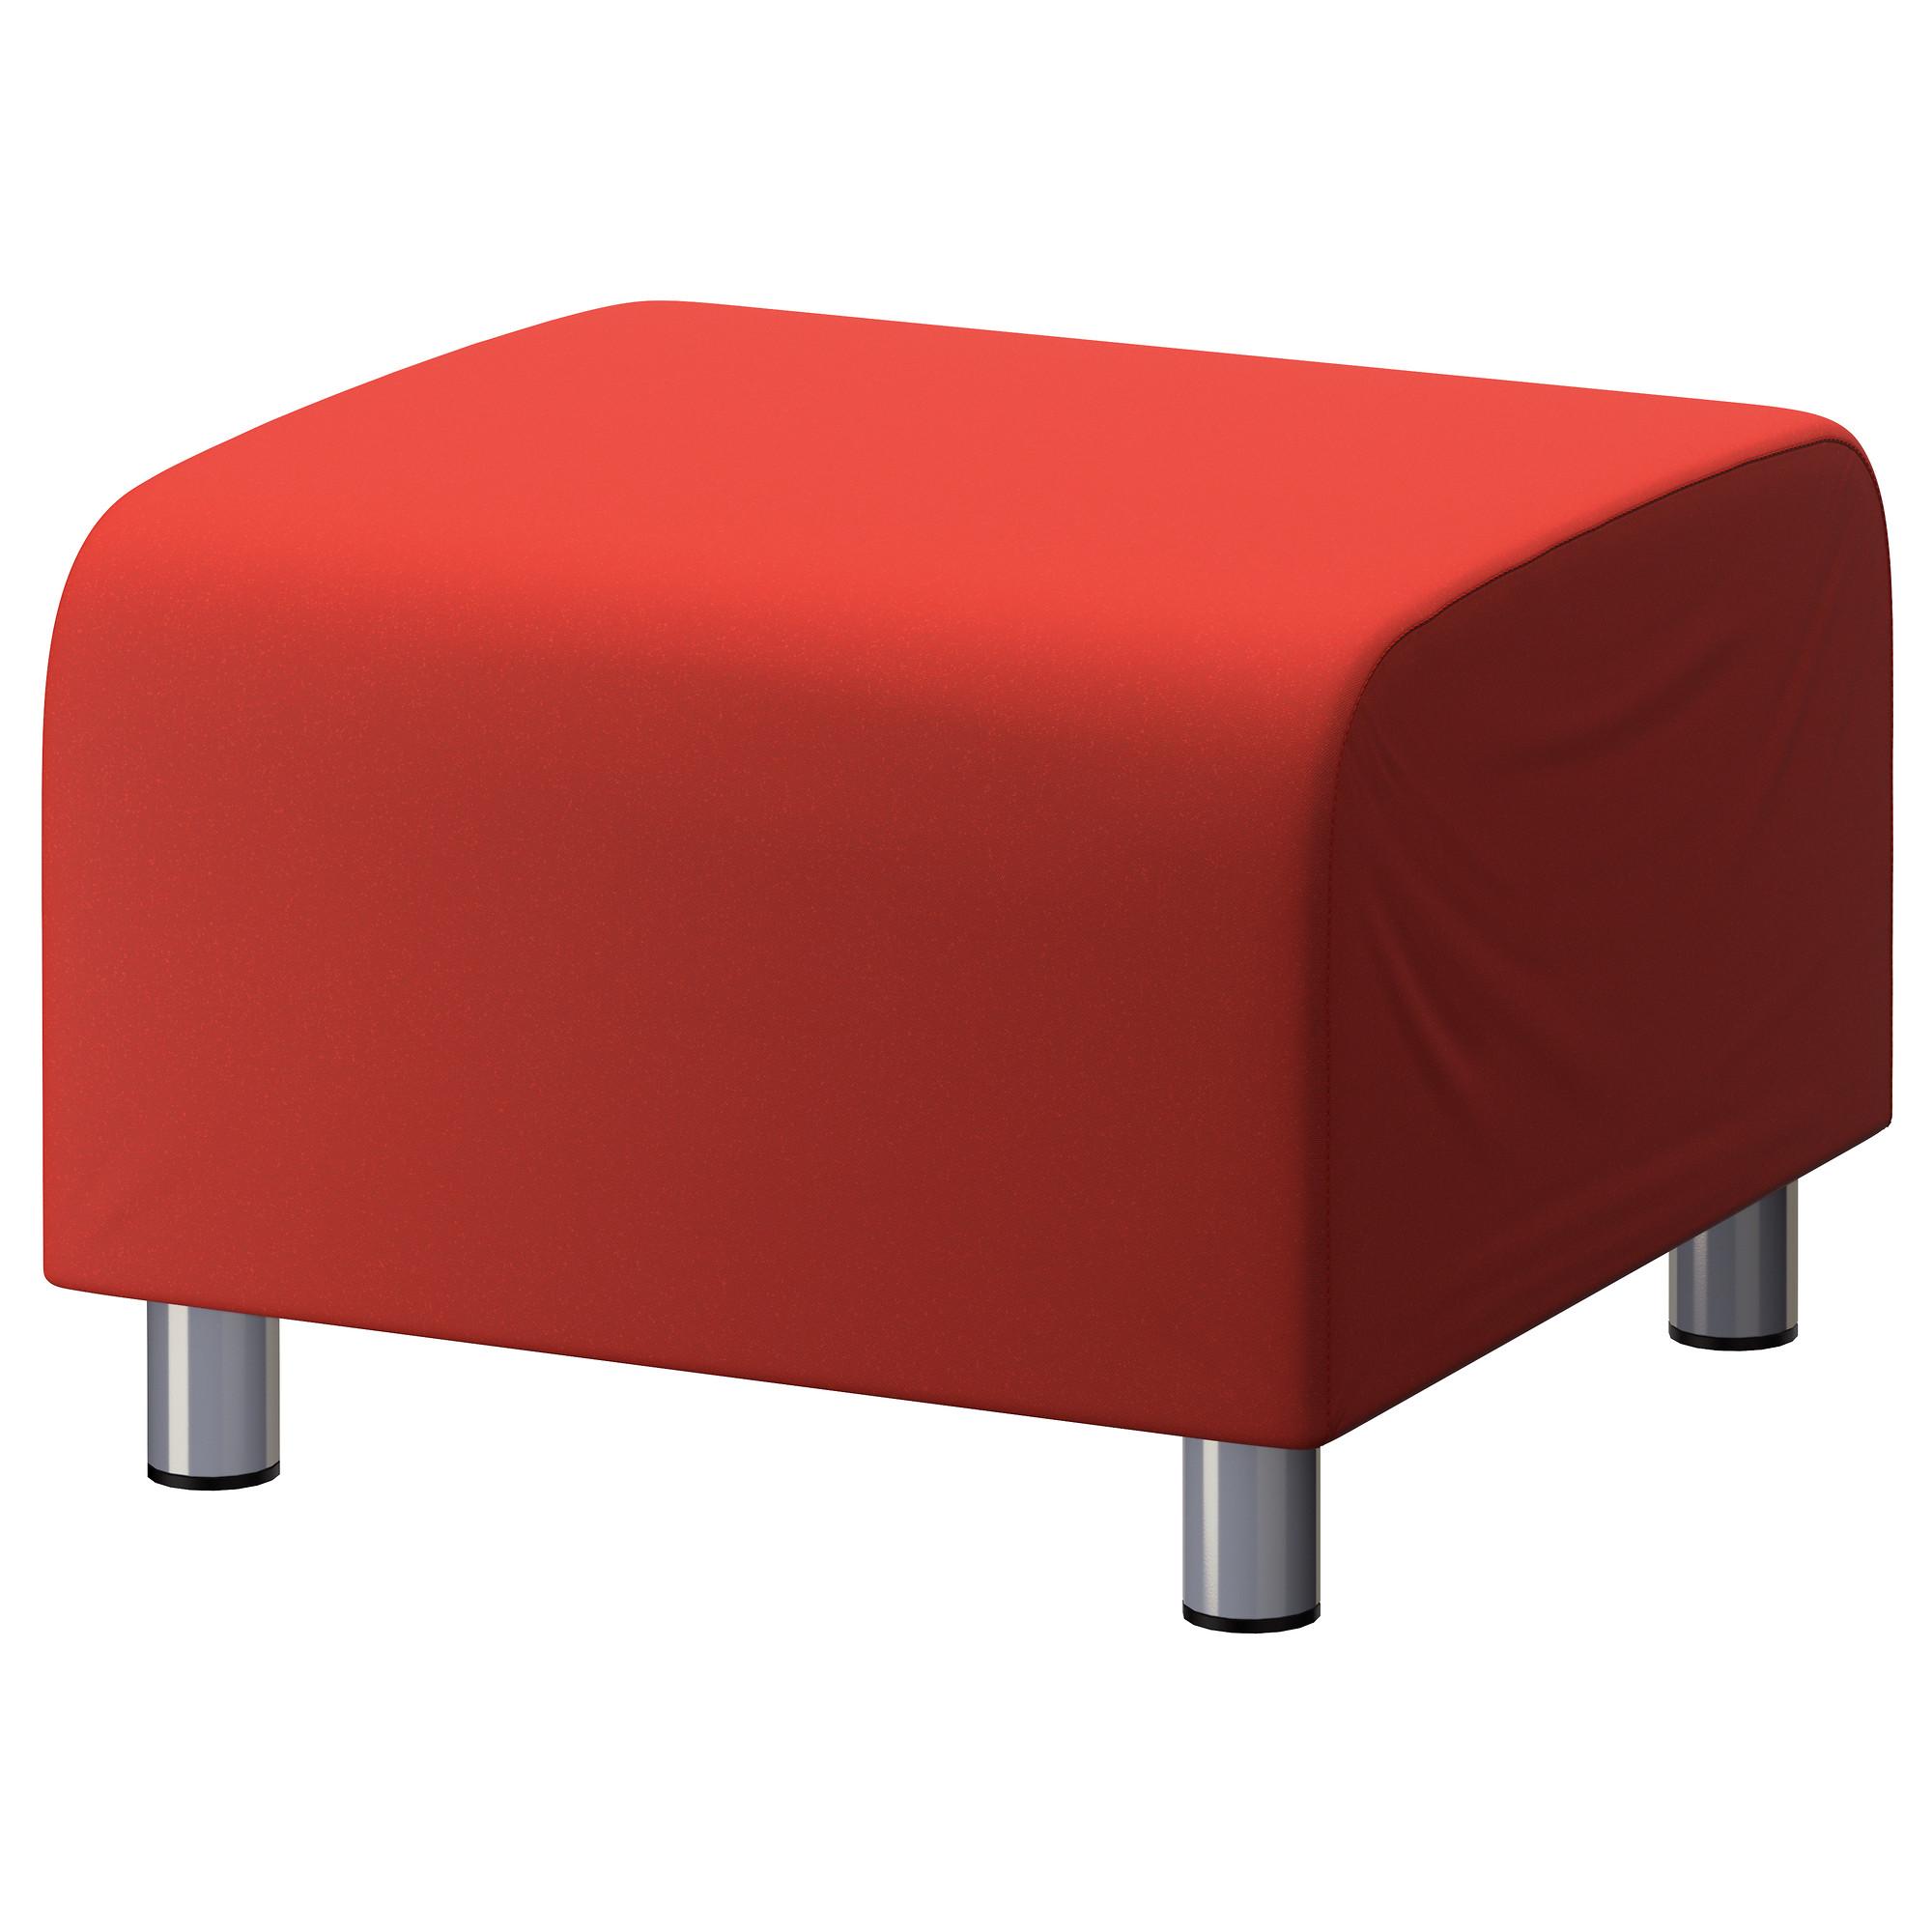 Custom Slip Cover for Ikea Klippan Footstool 100% Cotton Sofa